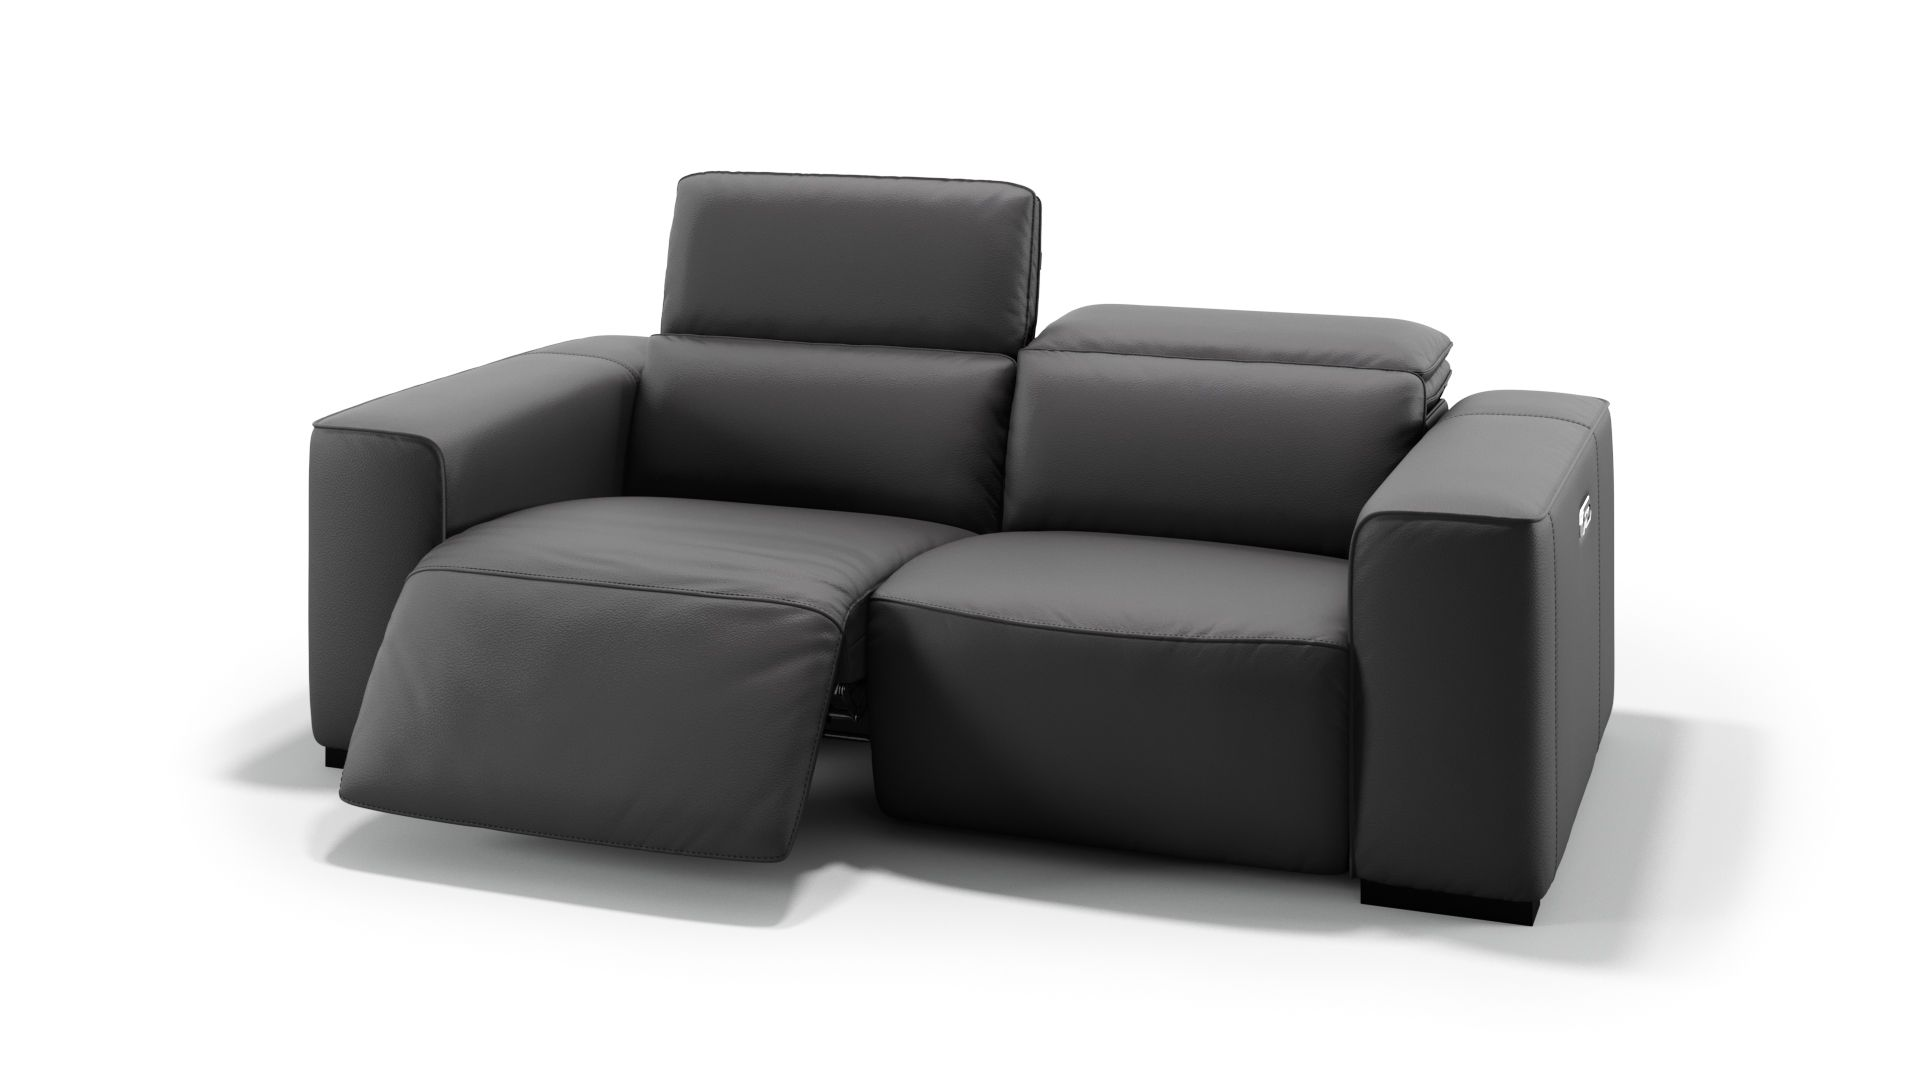 Ledersofa Binetto Moderne Sofas günstig   Sofanella